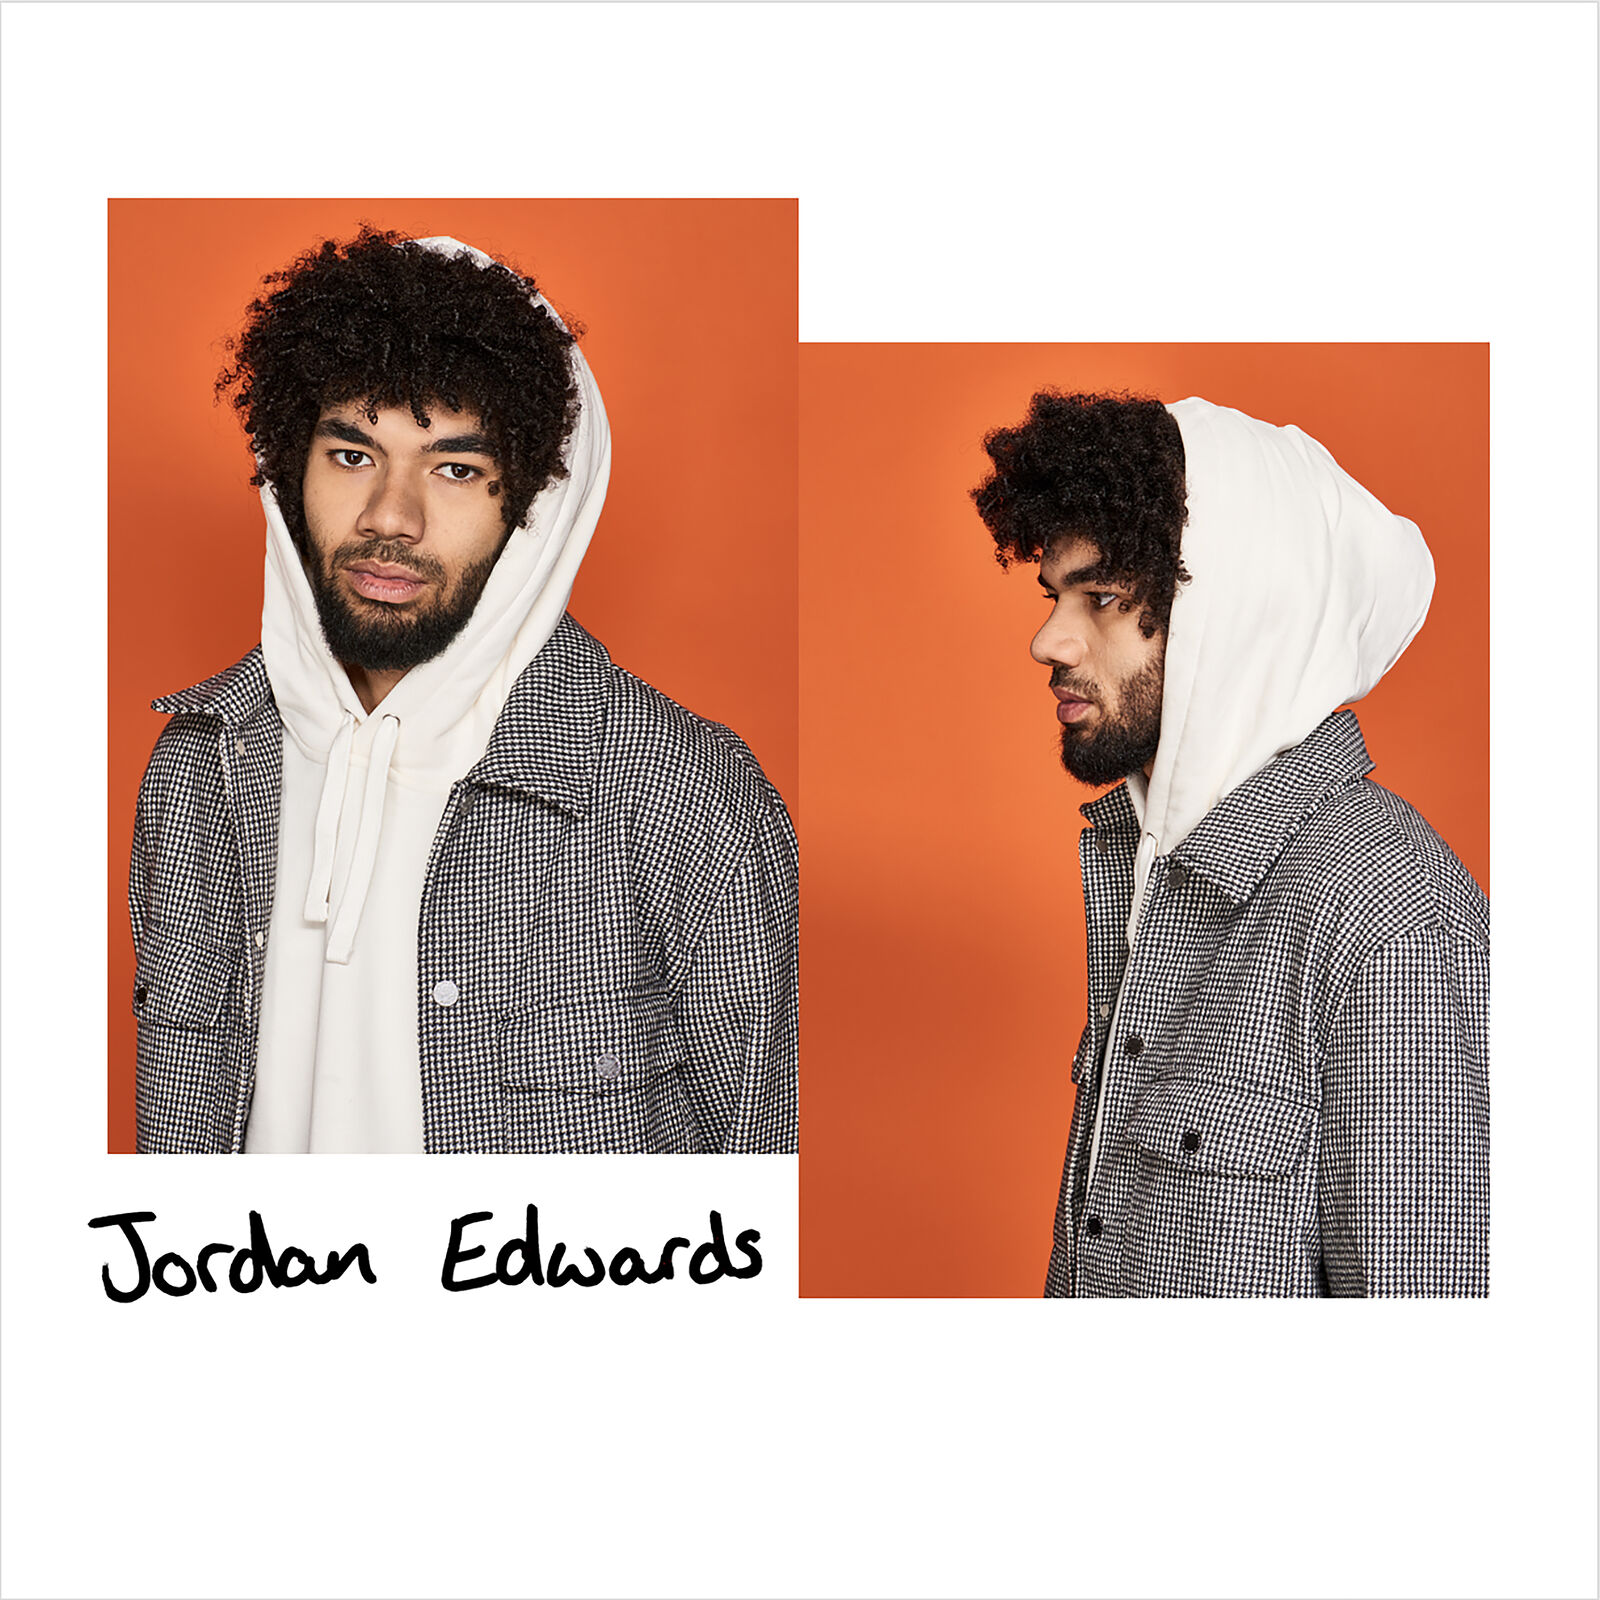 Jordan Edwards : Own Your Future